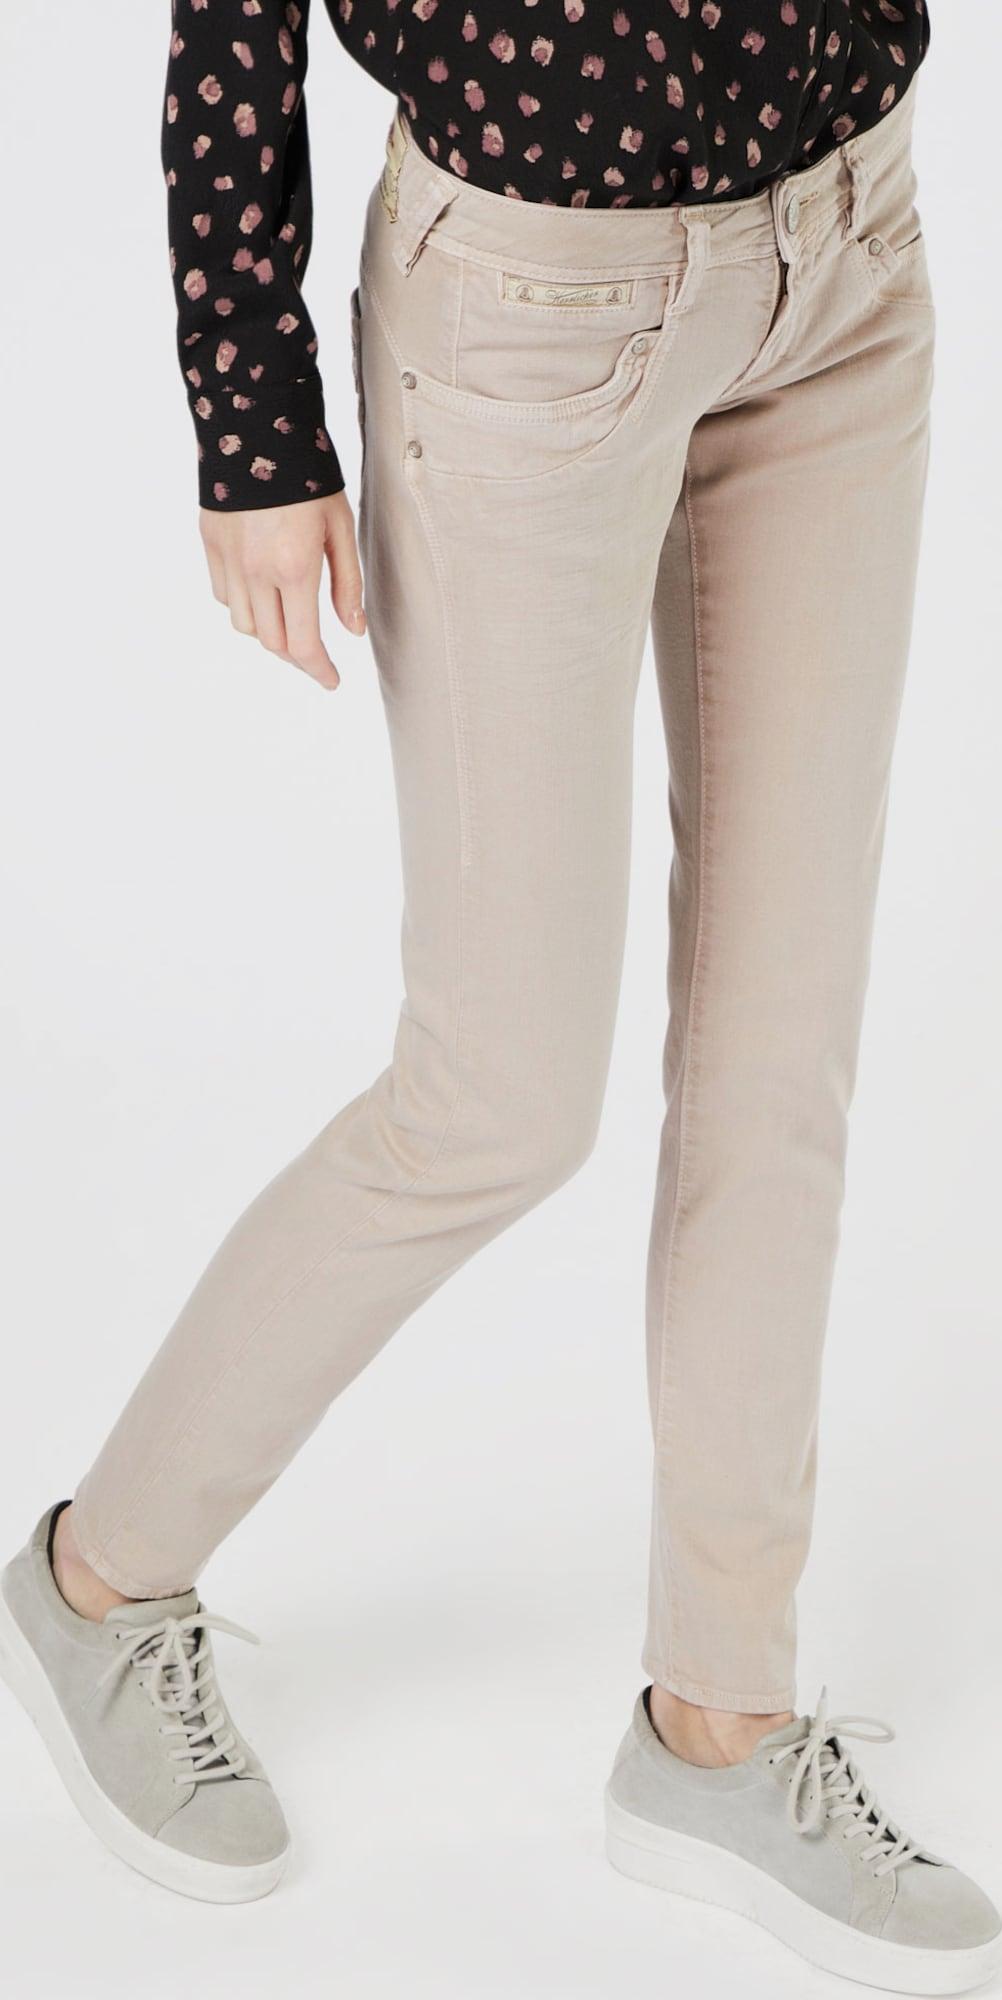 herrlicher jeans 39 piper slim 39 in beige about you. Black Bedroom Furniture Sets. Home Design Ideas